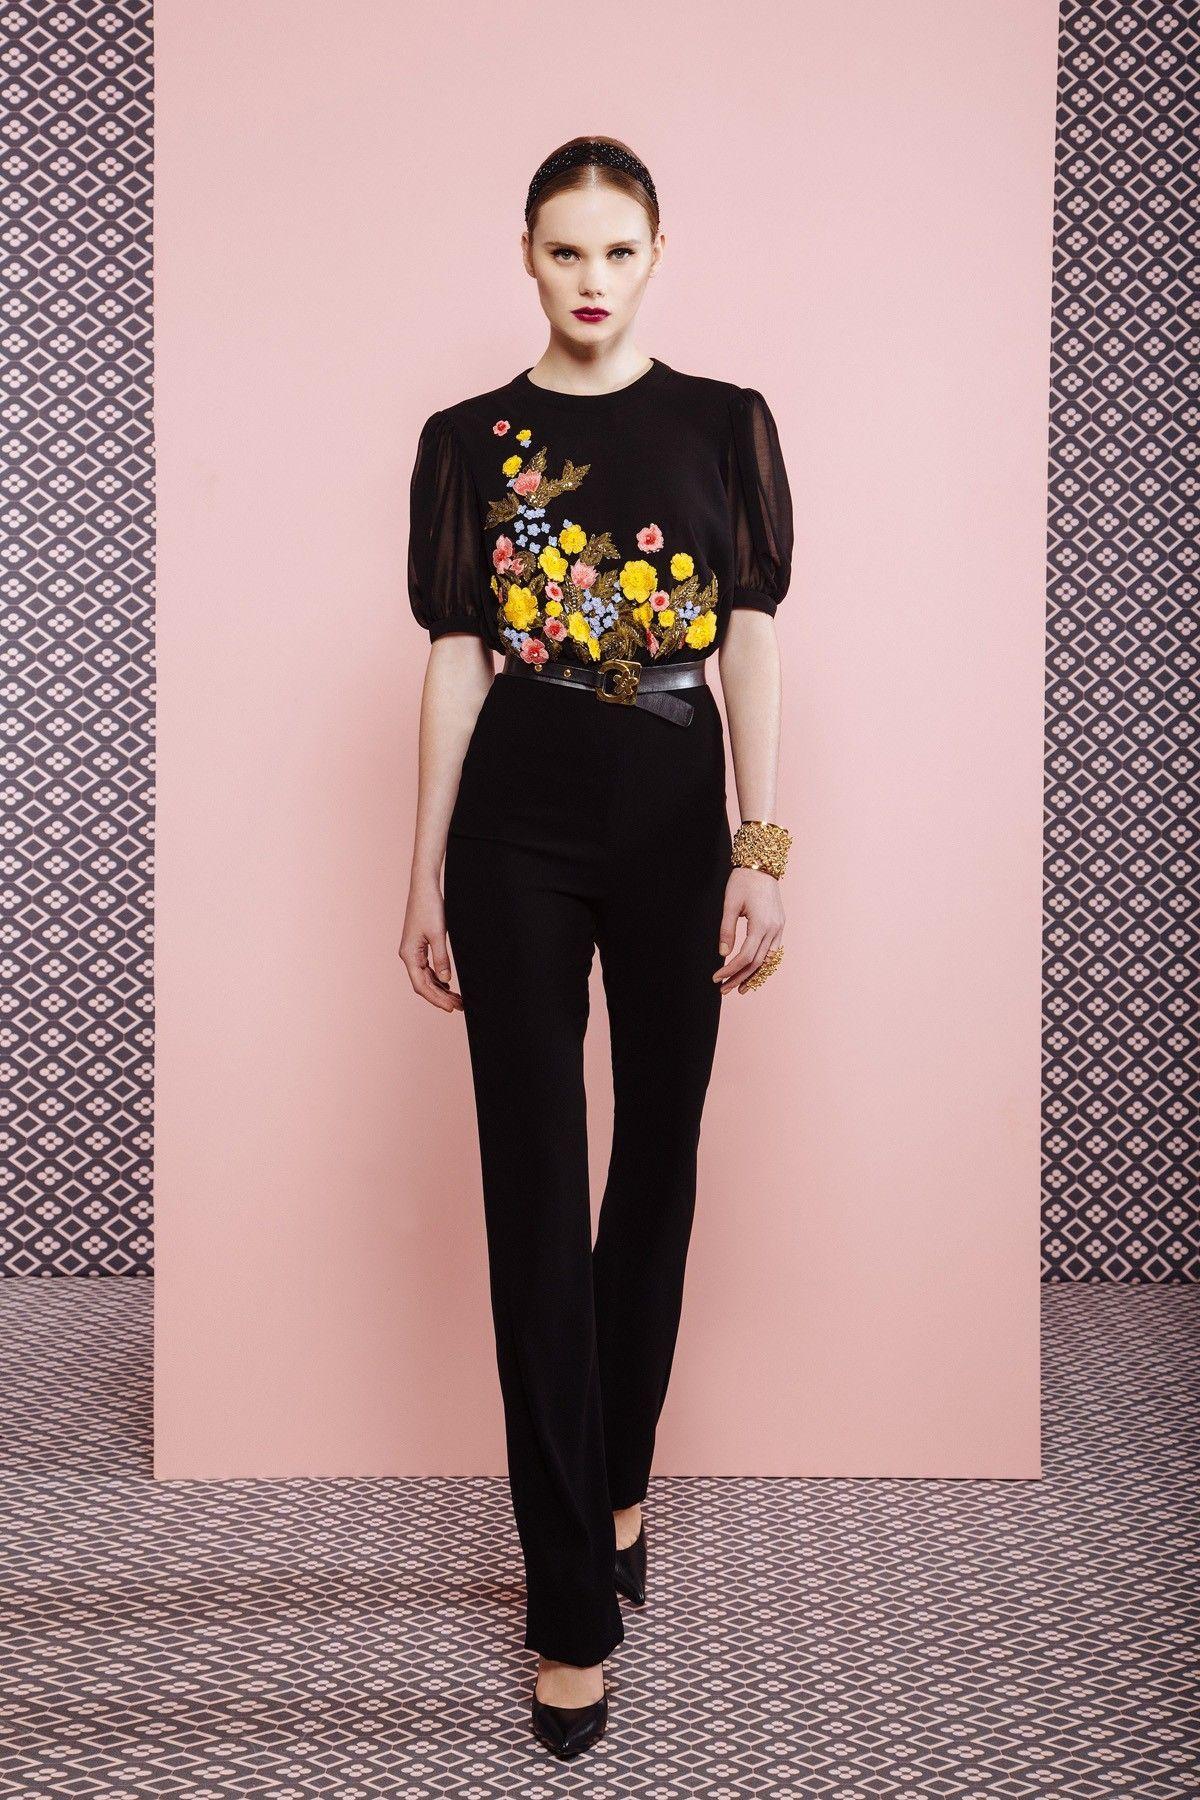 DISEÑO ELEGANTE | Moda femenina | Pinterest | Elegante, Trajes de ...